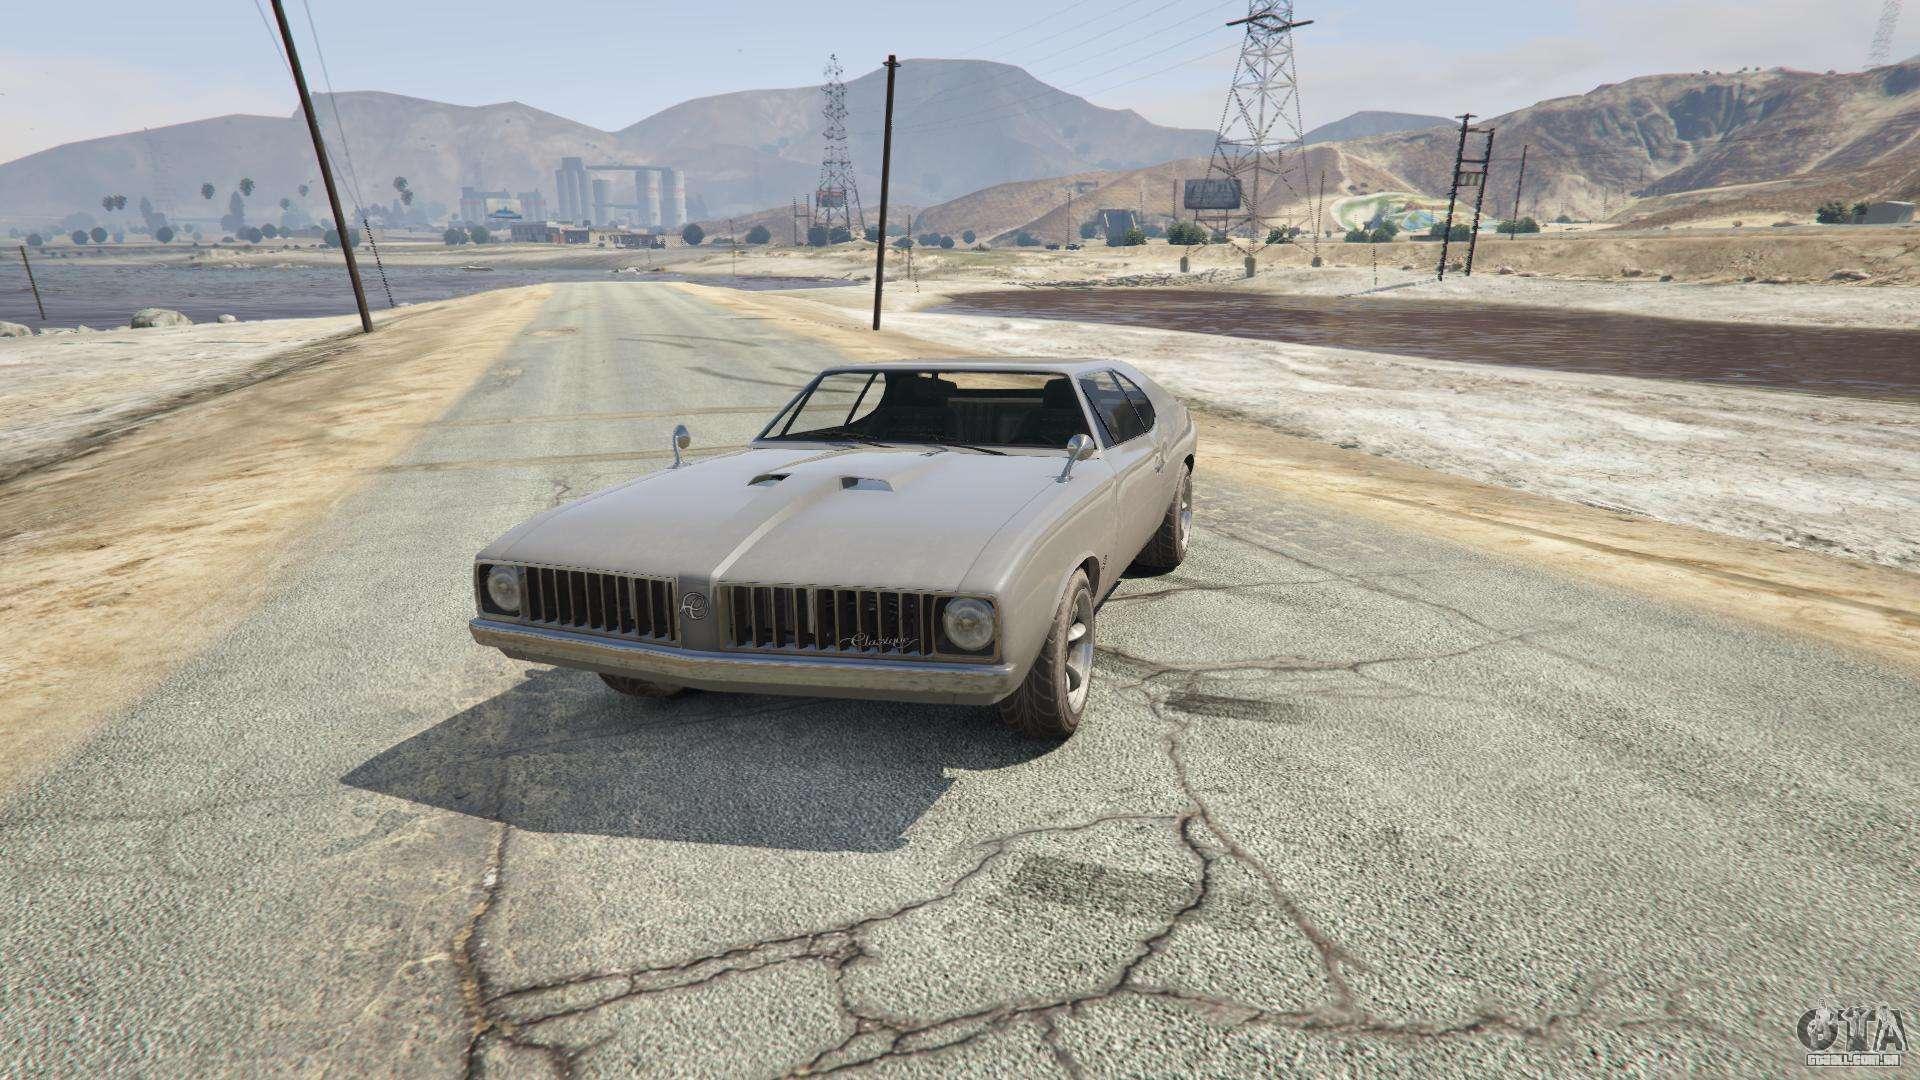 Stallion do GTA 5 - vista frontal